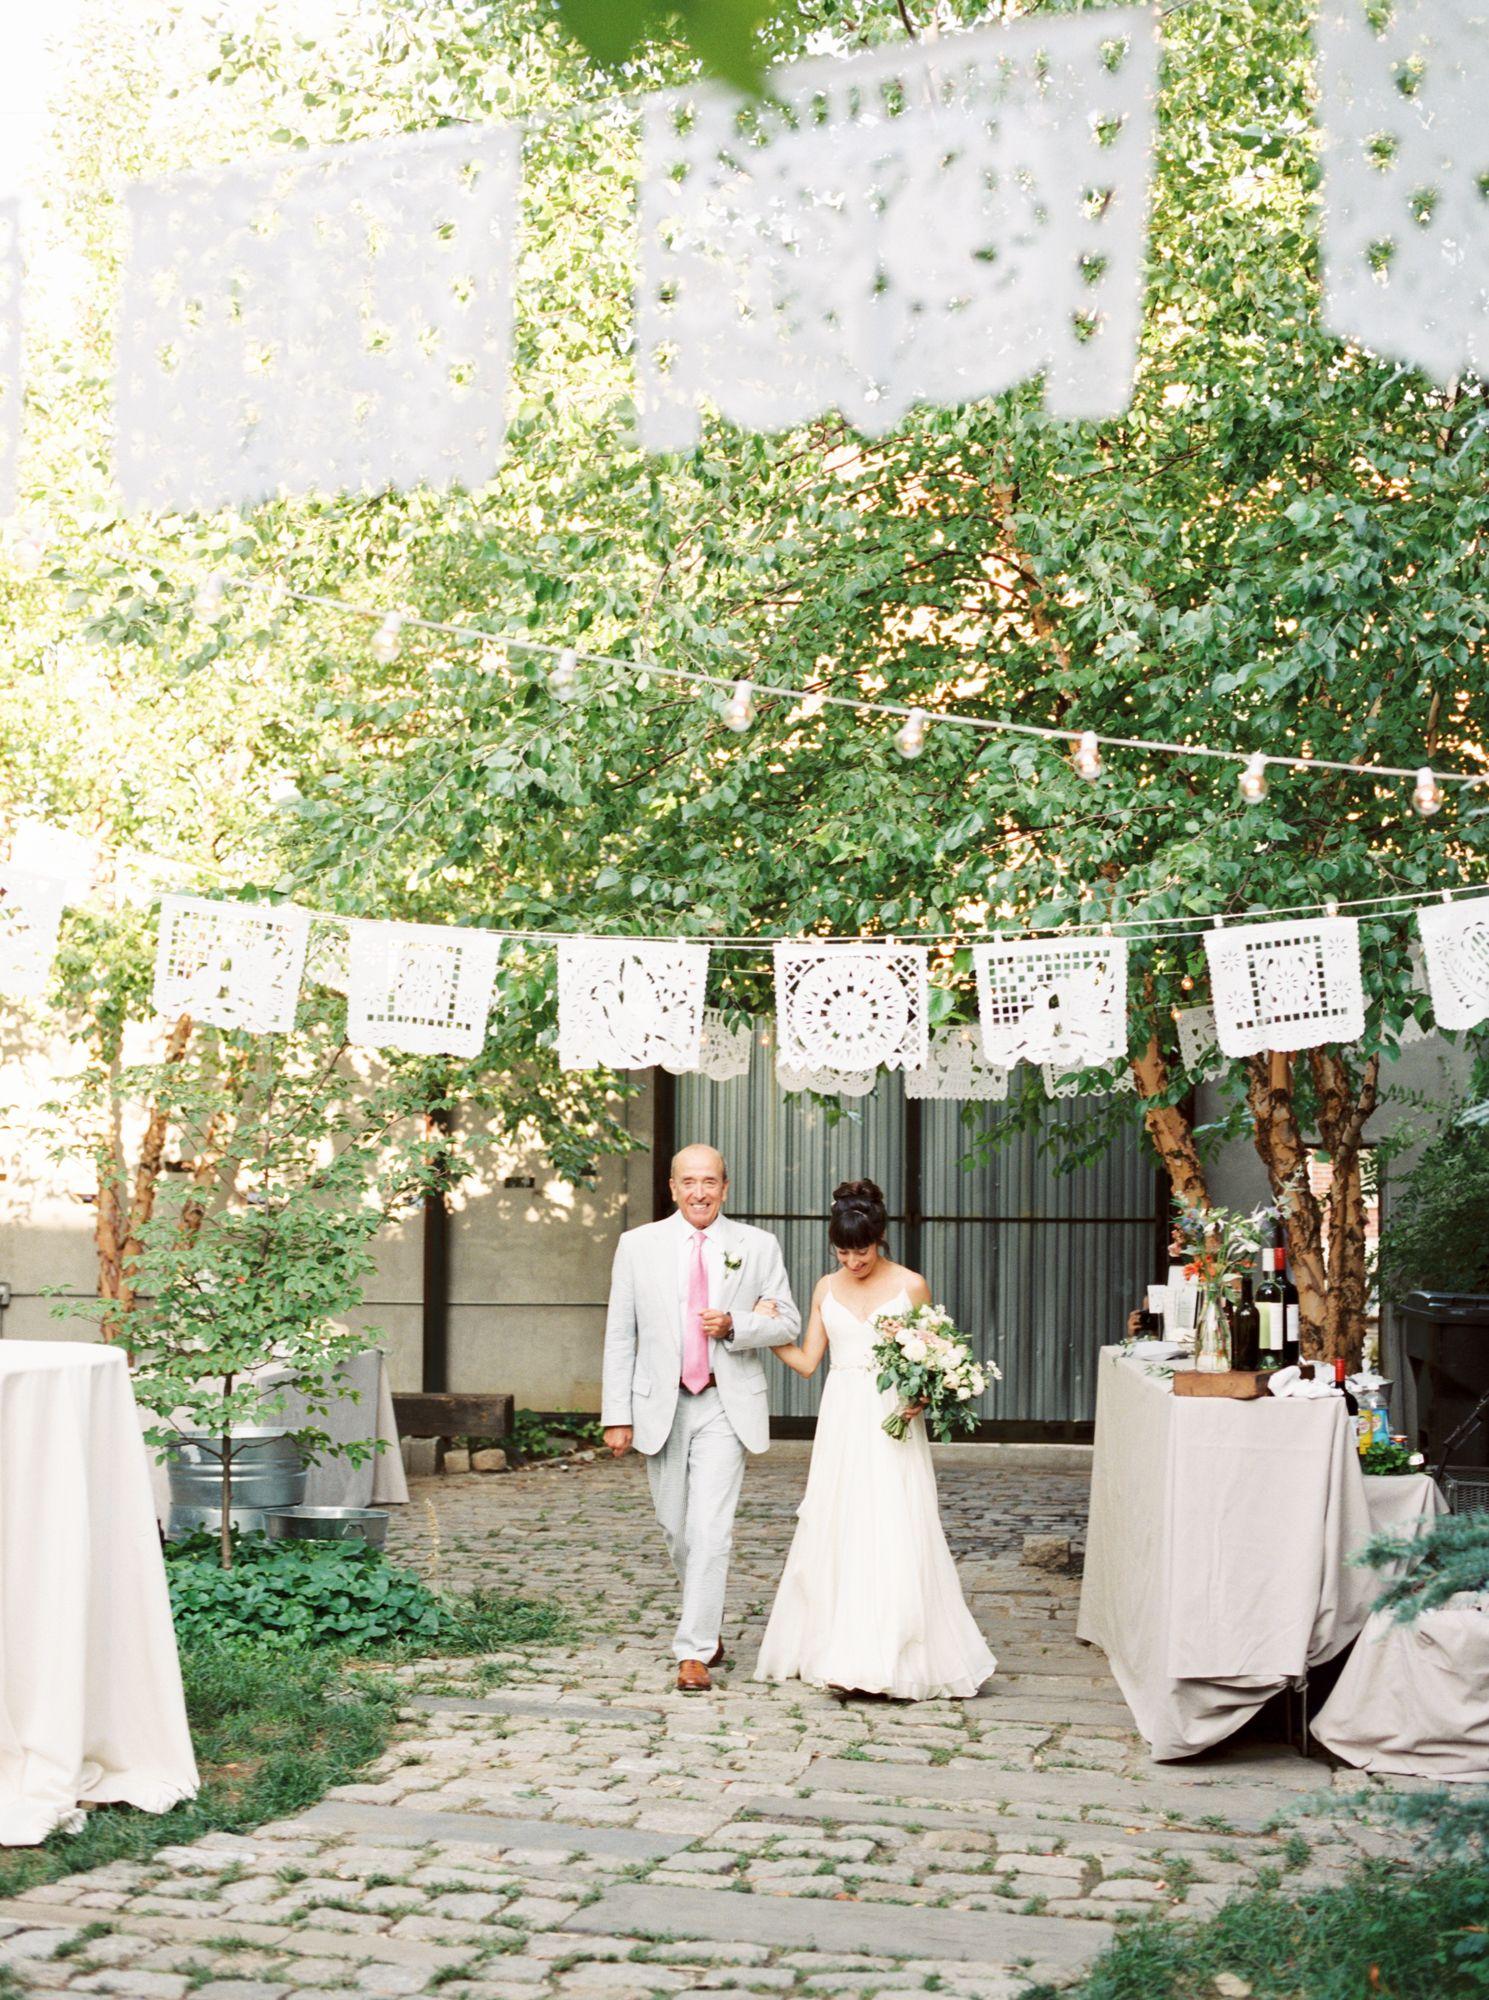 Elegant & Urban Summer Garden Party Maas Building Wedding by Haley Richter Photography